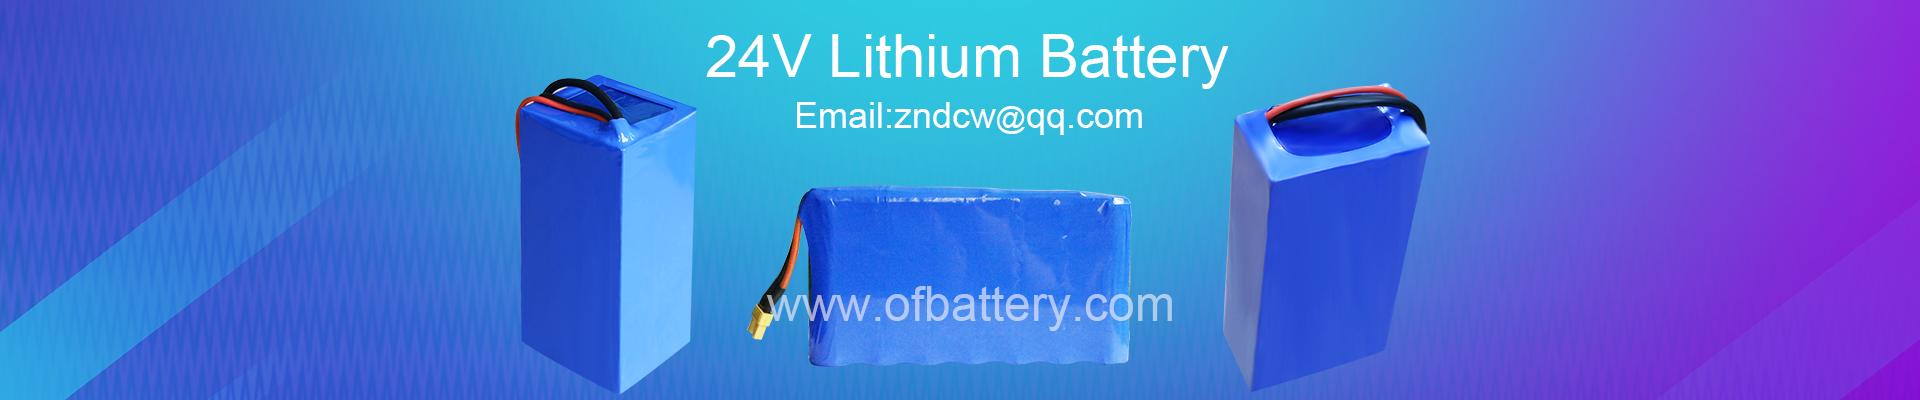 Lithium battery technology